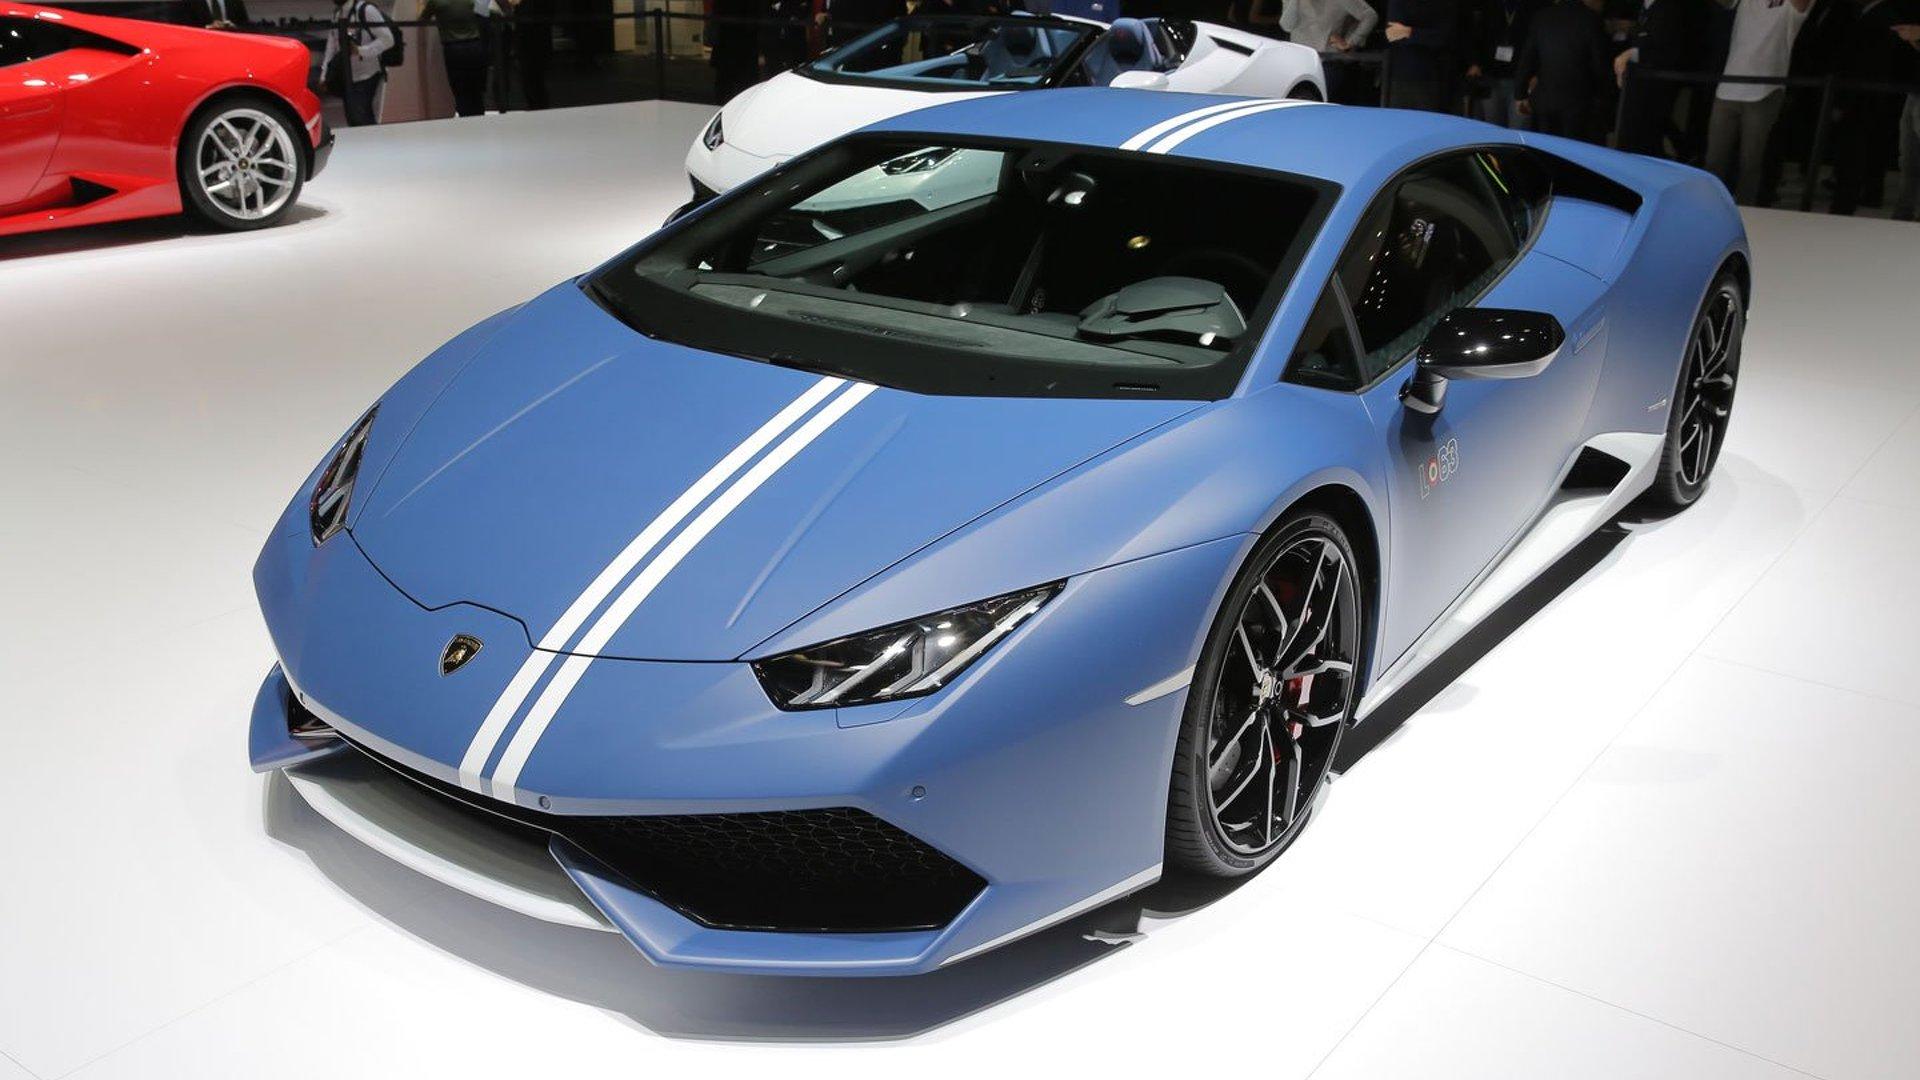 Lamborghini Huracan Avio has visual tweaks in Geneva